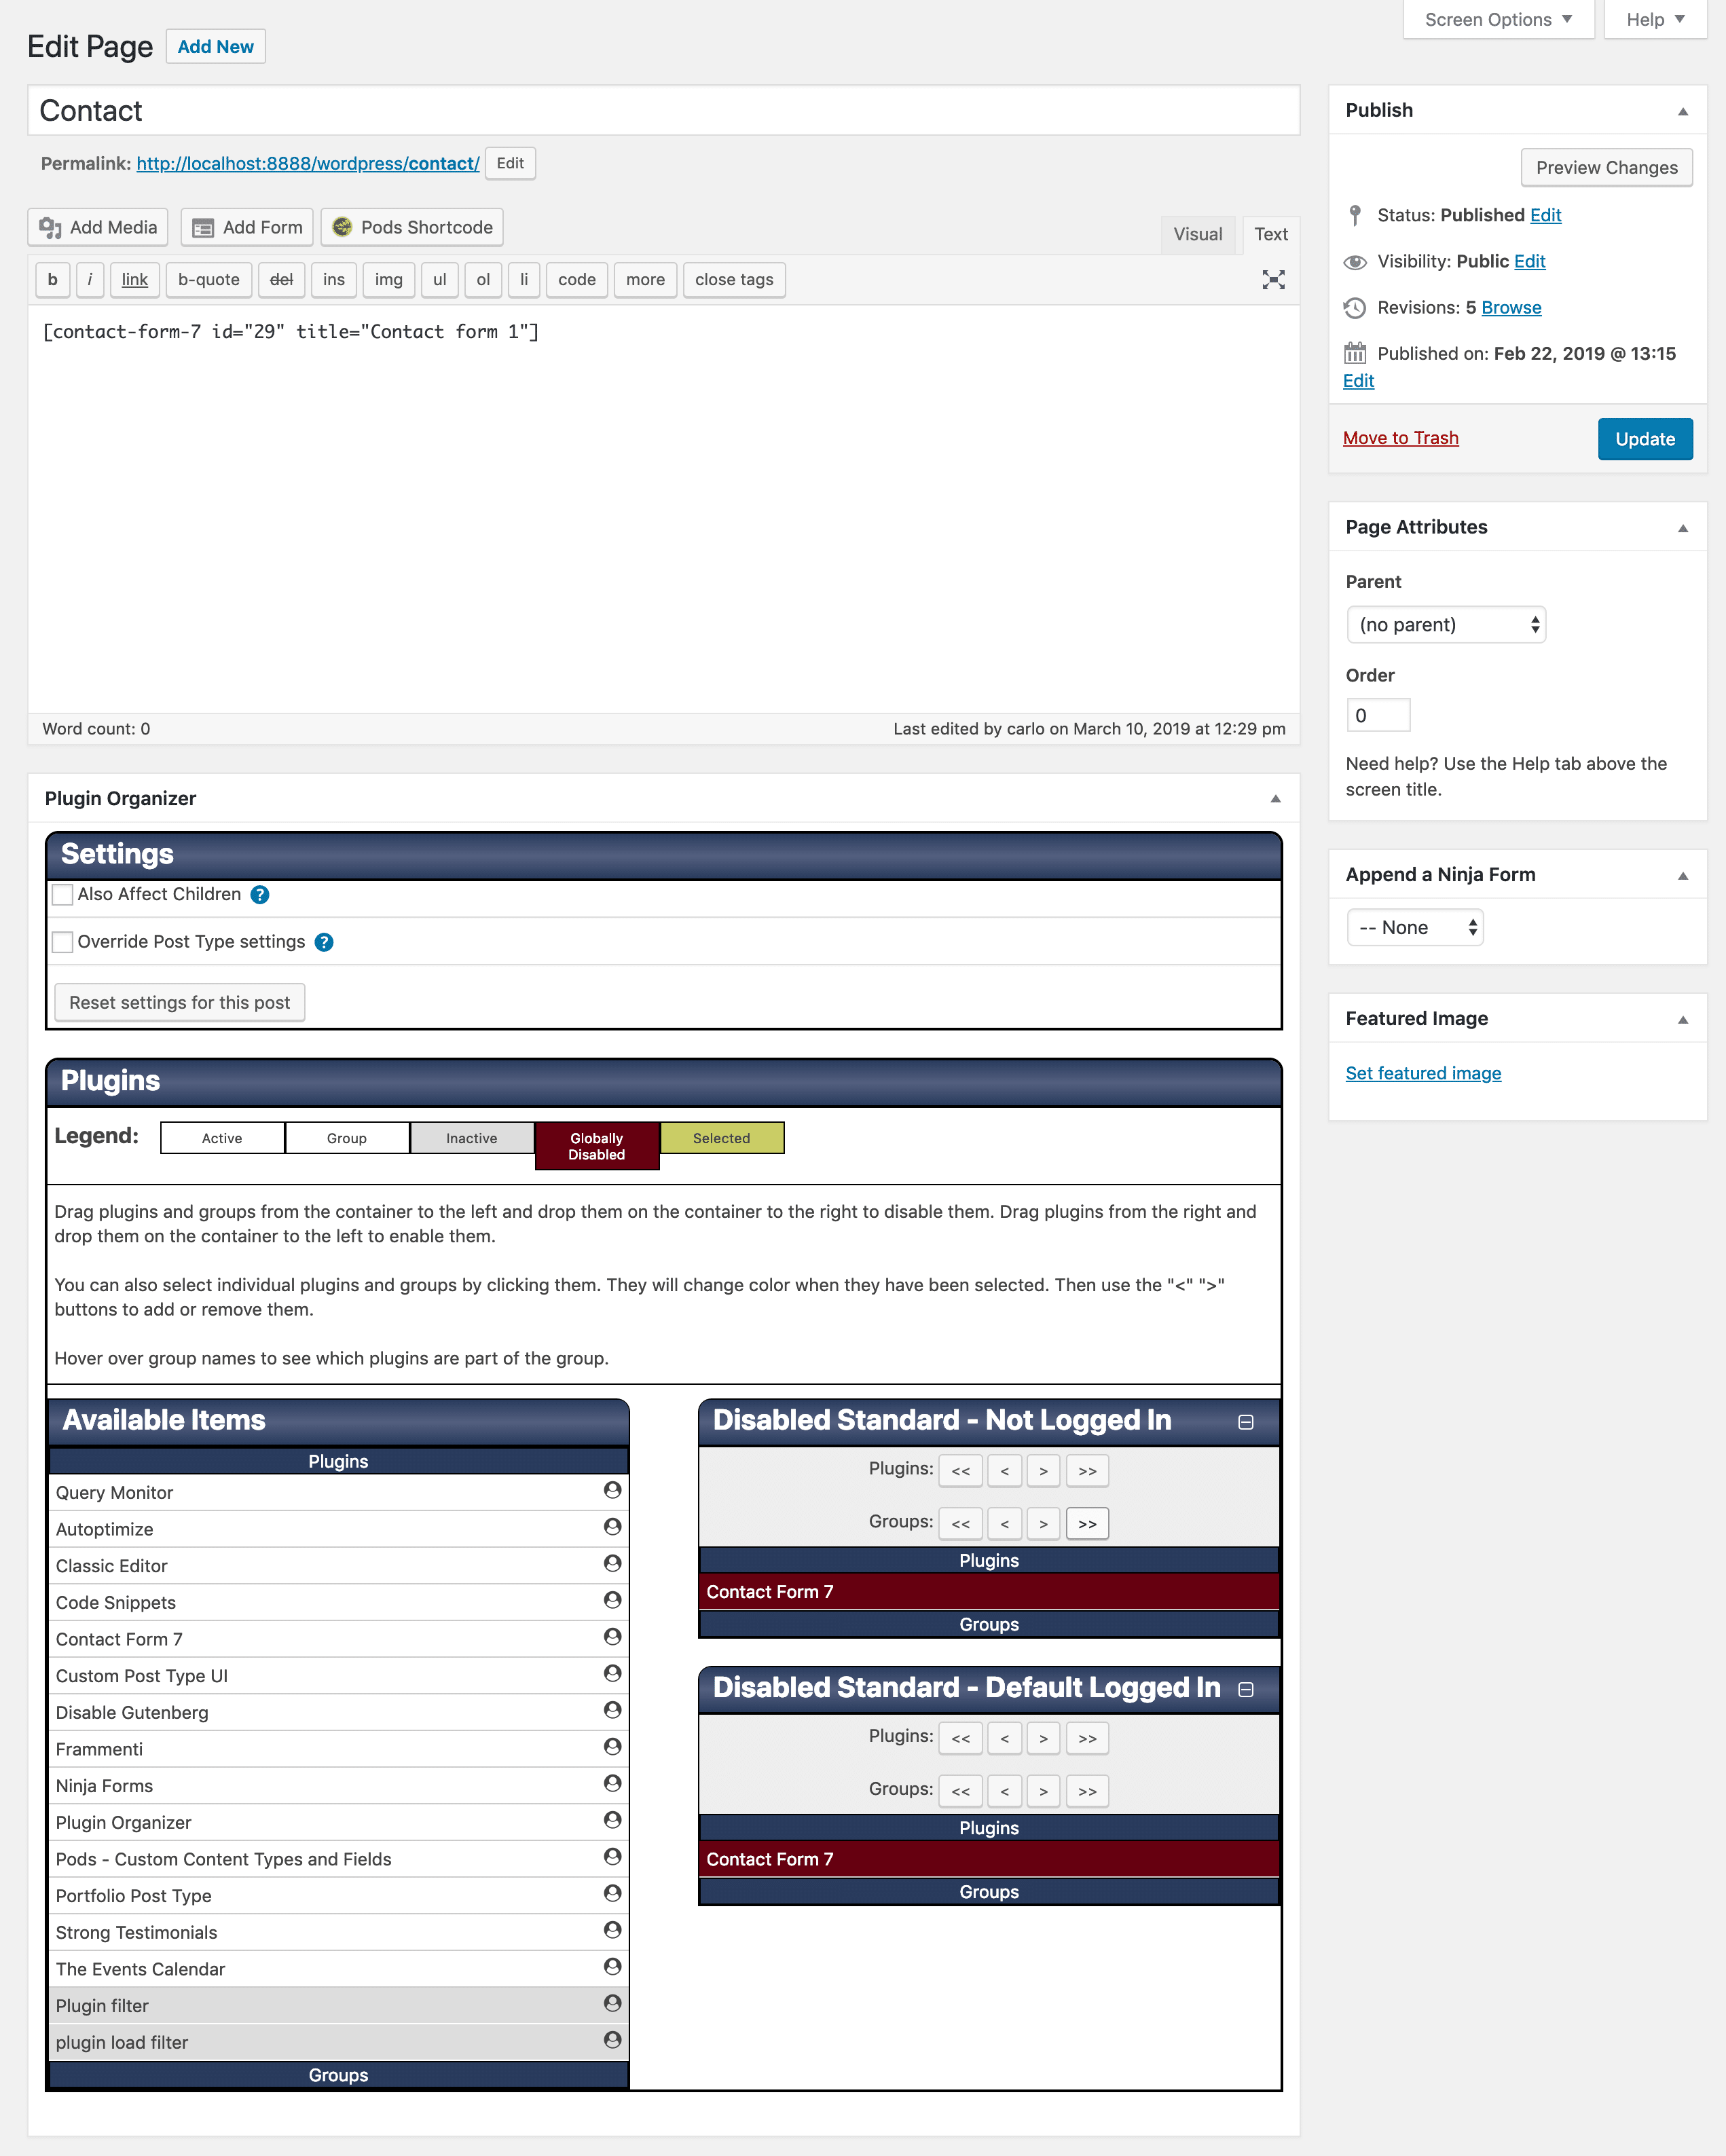 Metabox personalizado do Plugin Organizer na página de contato